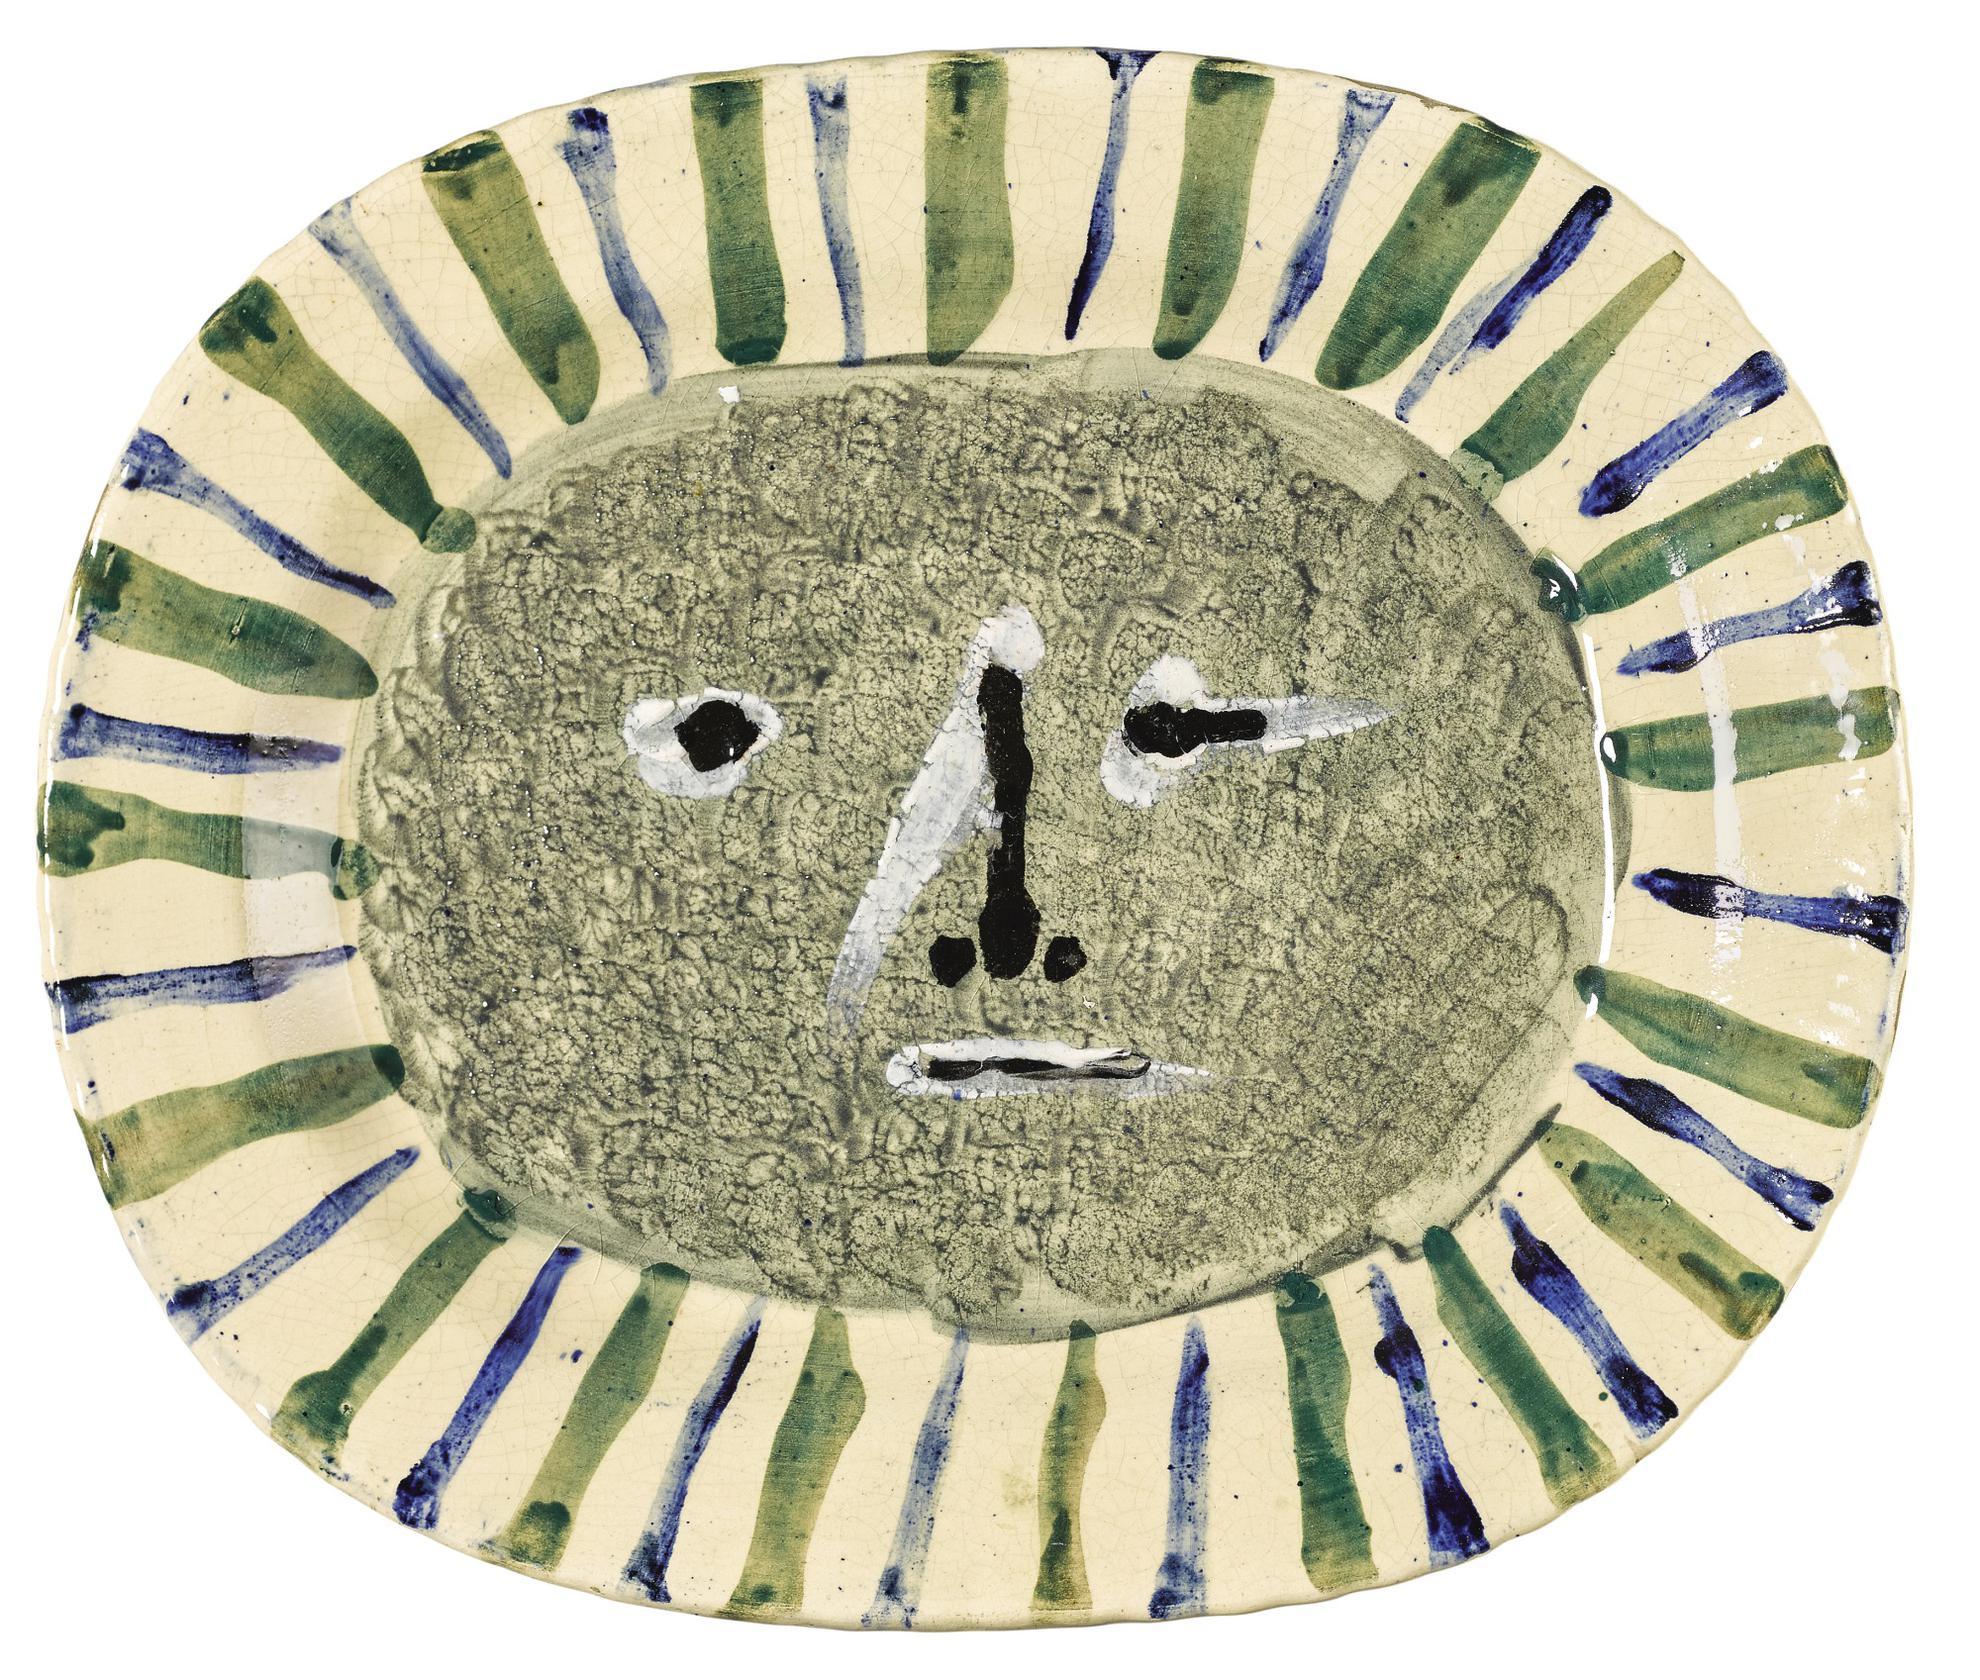 Pablo Picasso-Plat Visage Masque-1947